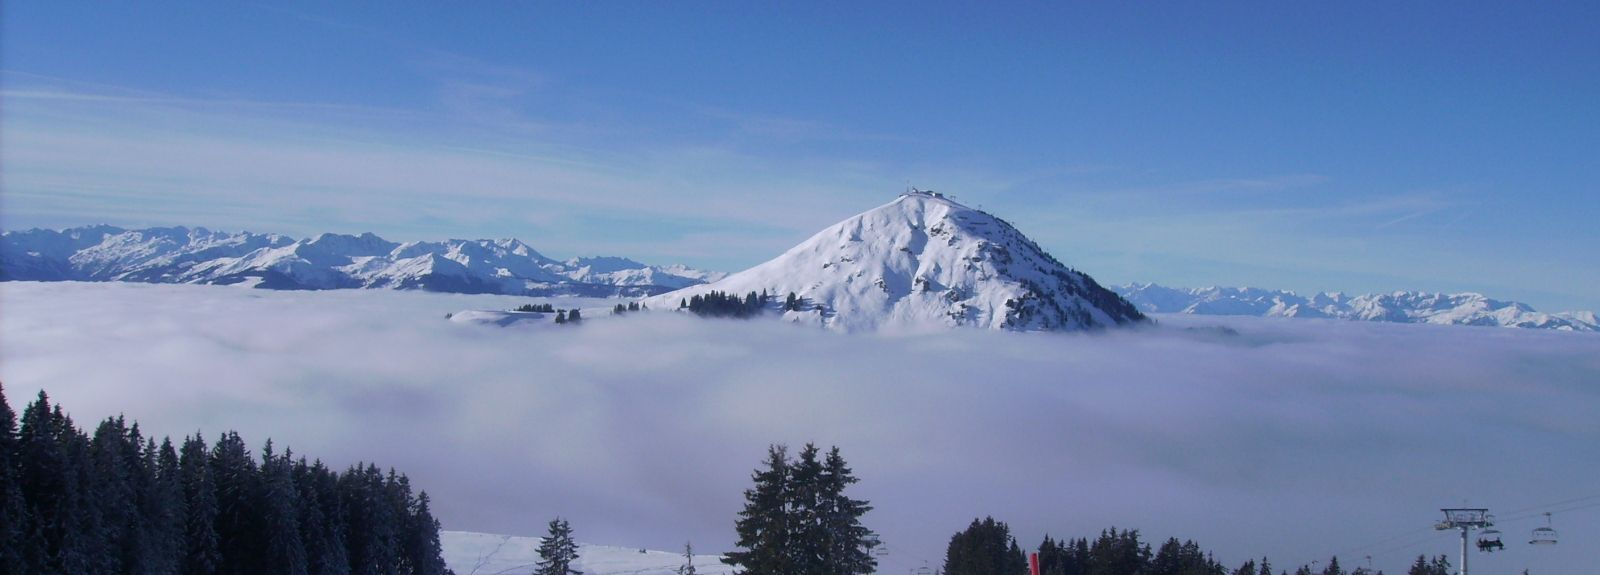 Angath, Tyrol, Austria